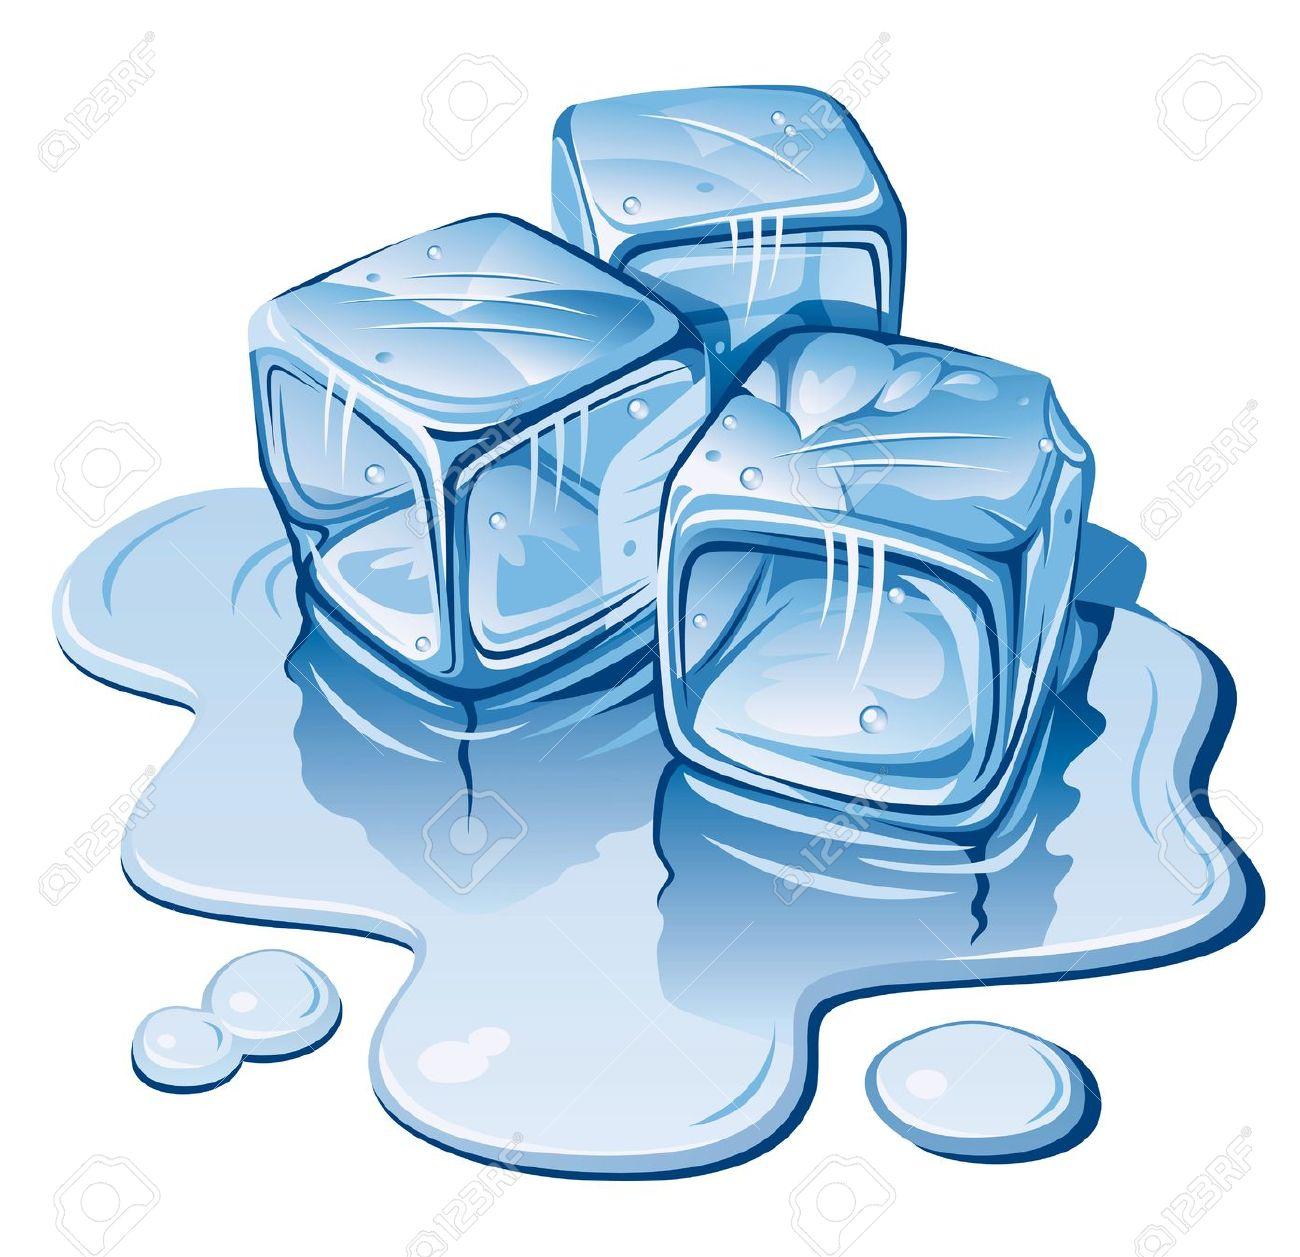 Ice Cube Clipart #1-Ice Cube Clipart #1-7